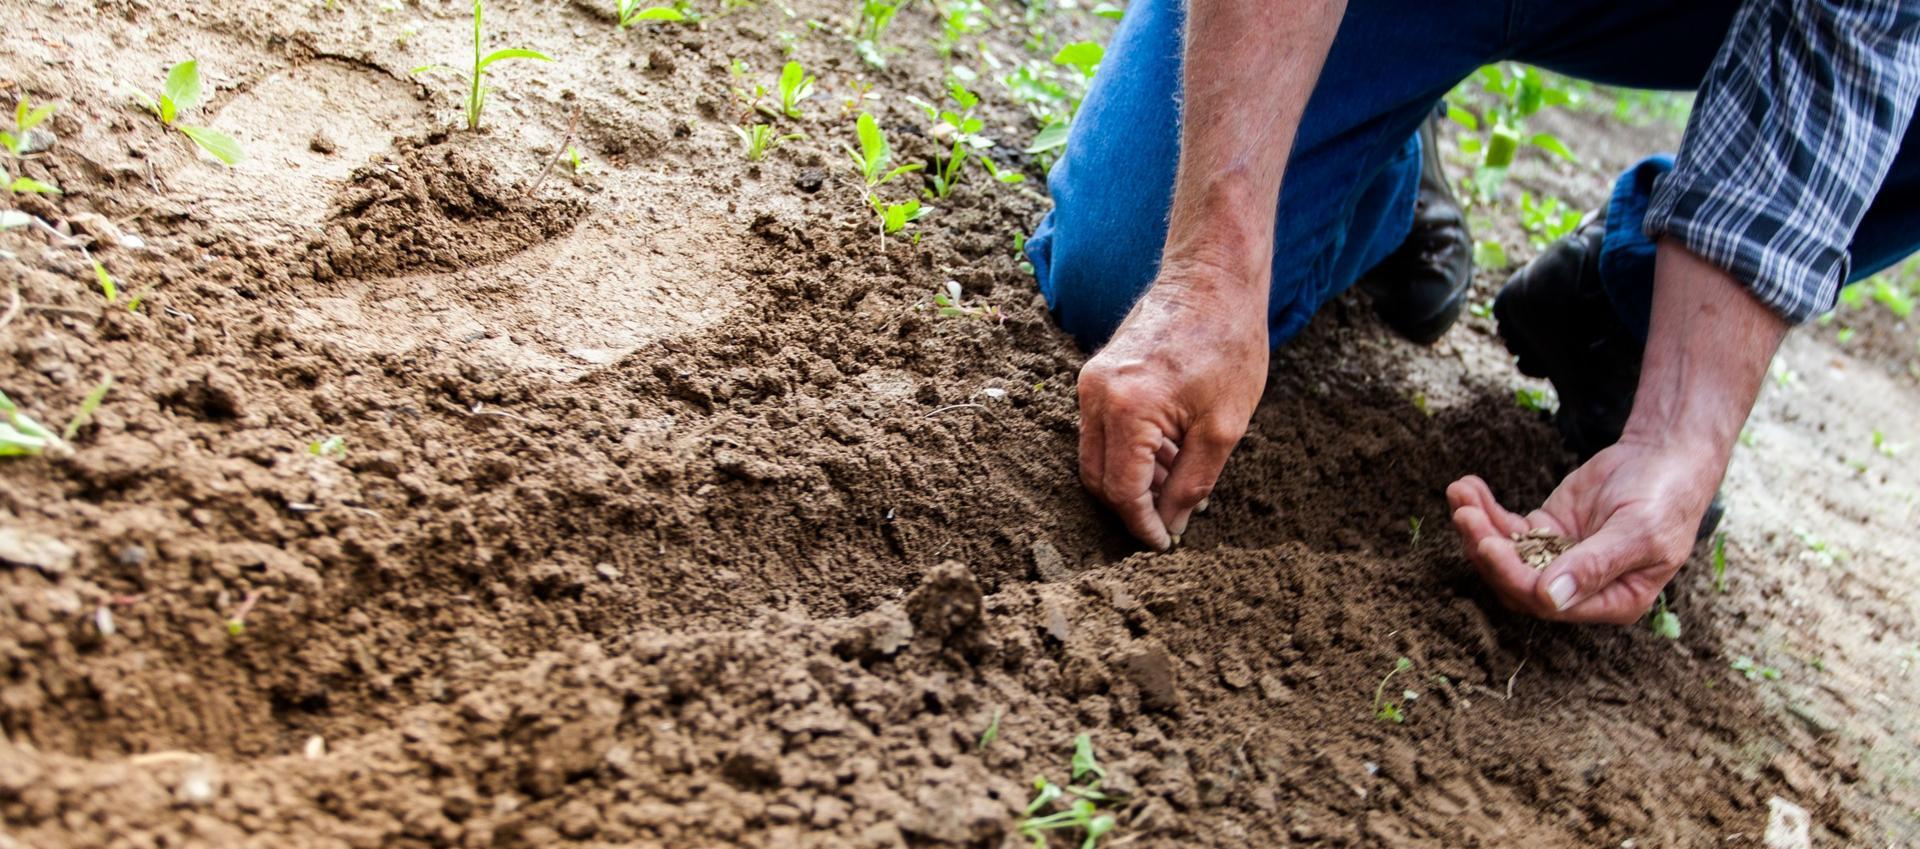 Fertilizing Without Soil Sample